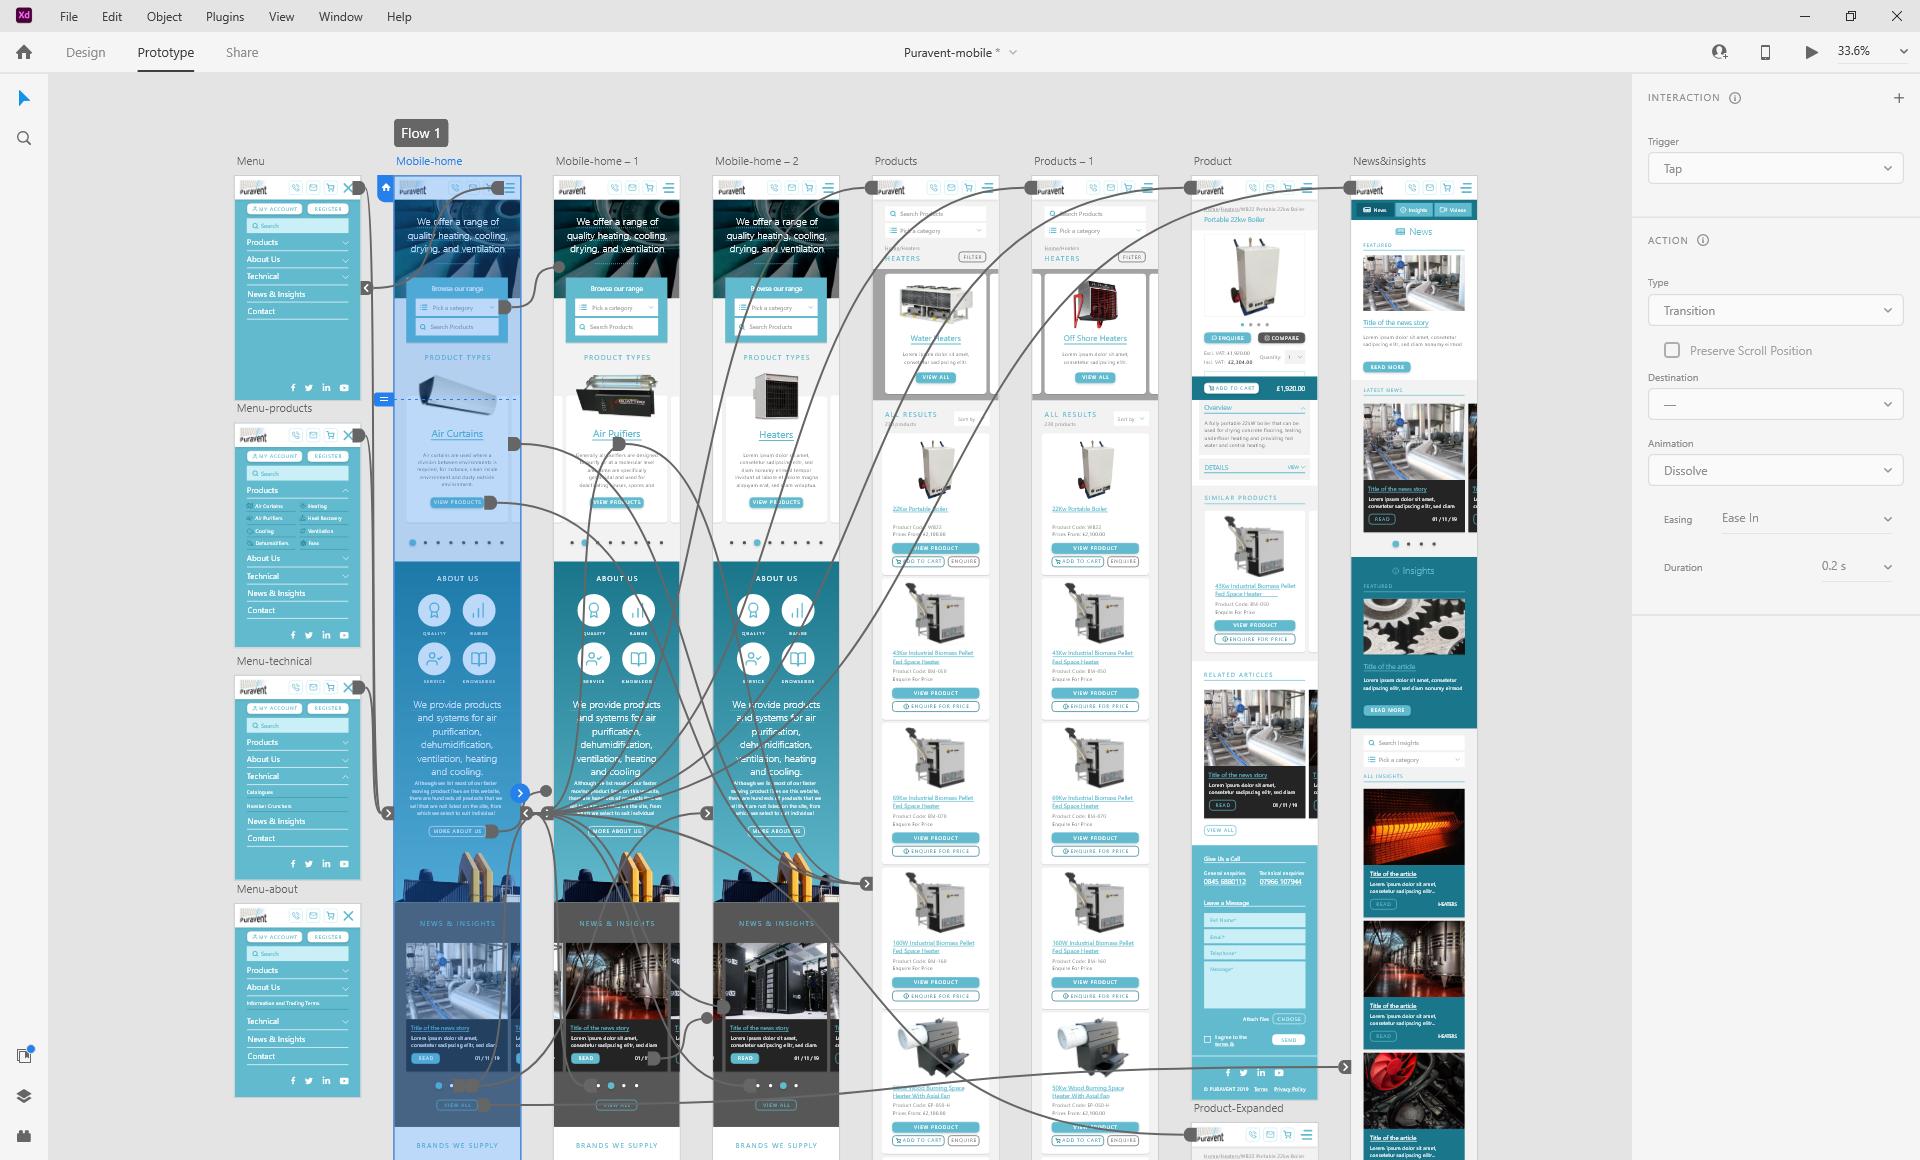 Adobe XD mobile website prototype